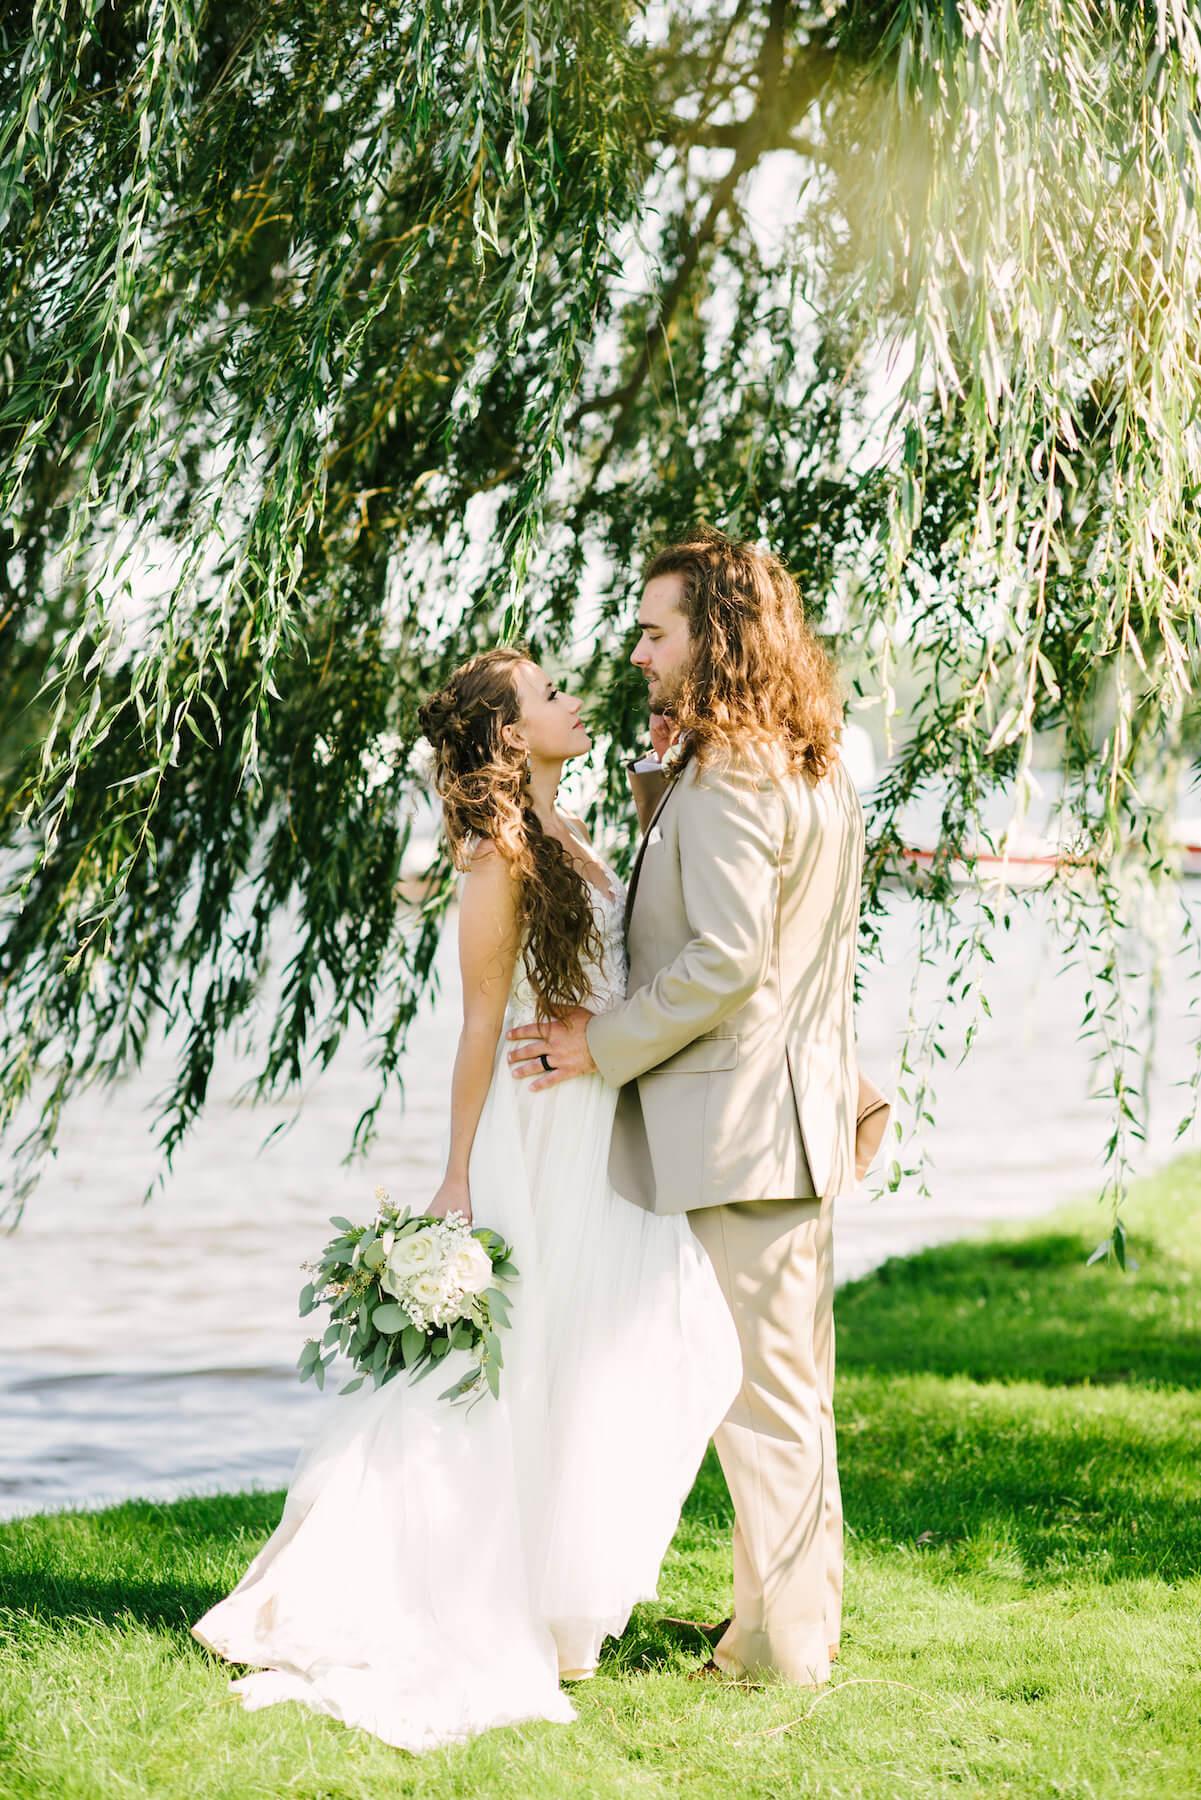 engle-olson-wedding-blair-taylor-25.jpg